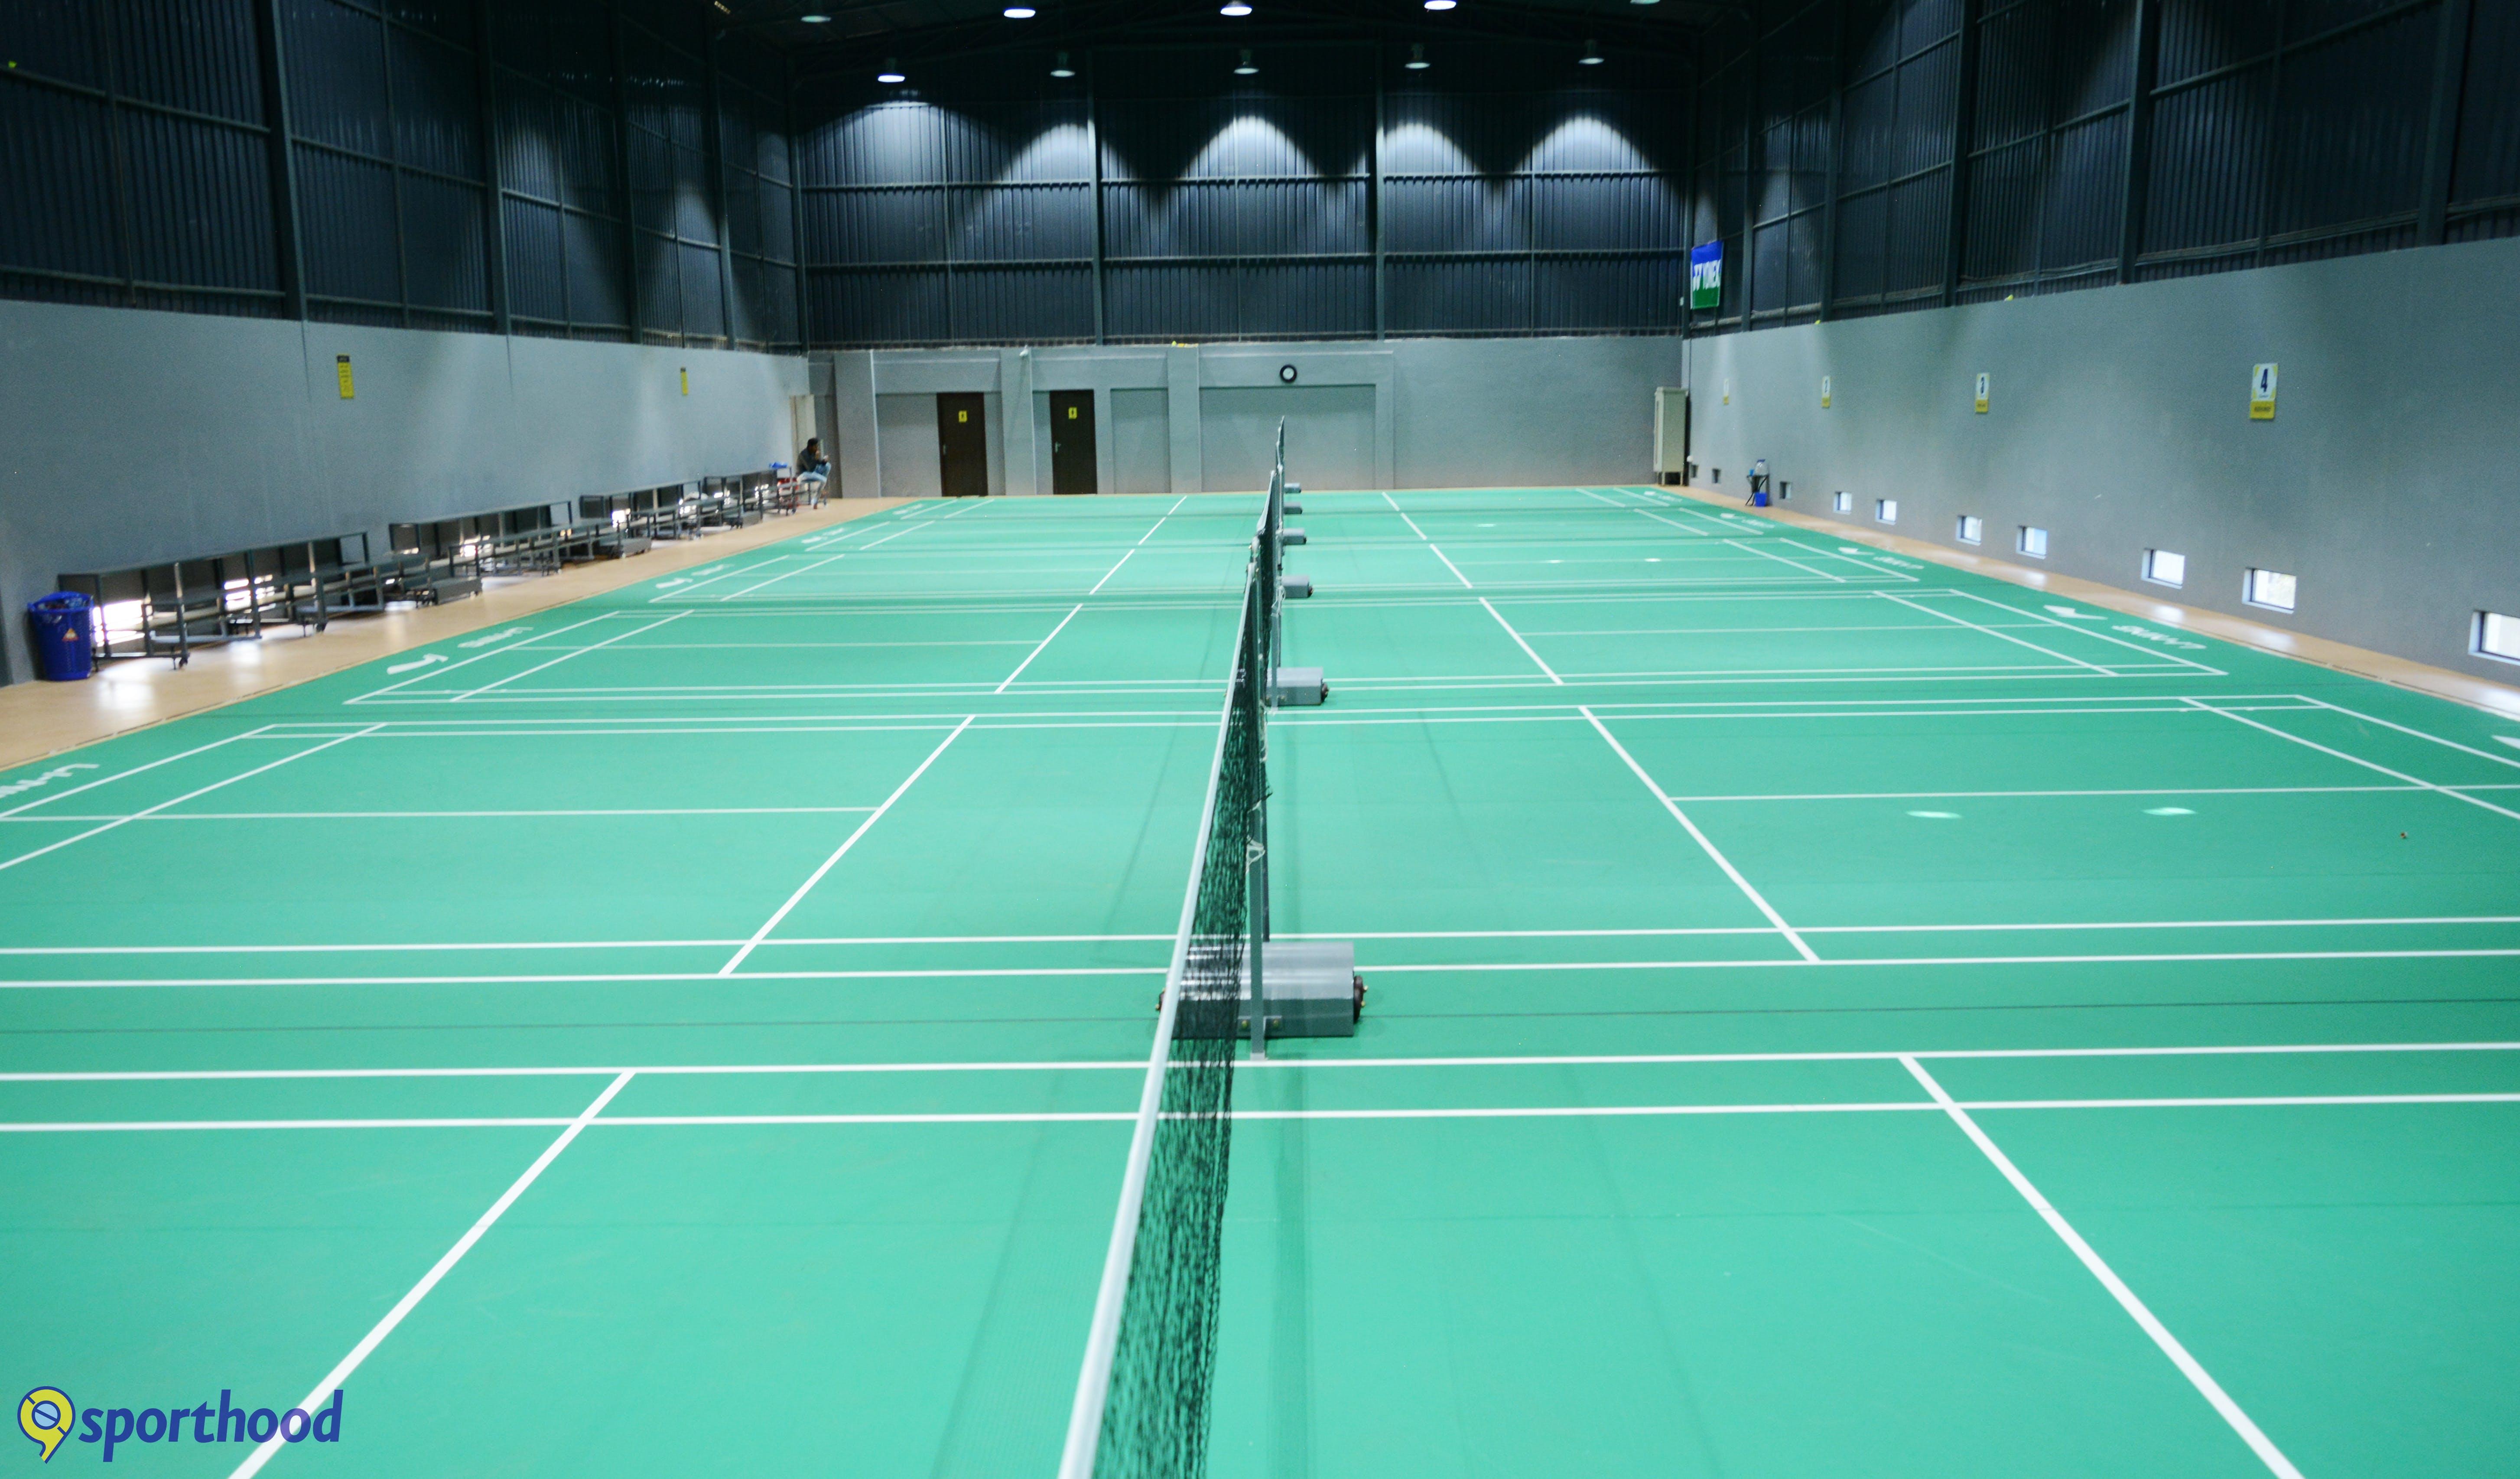 Sporthood Badminton Arena3